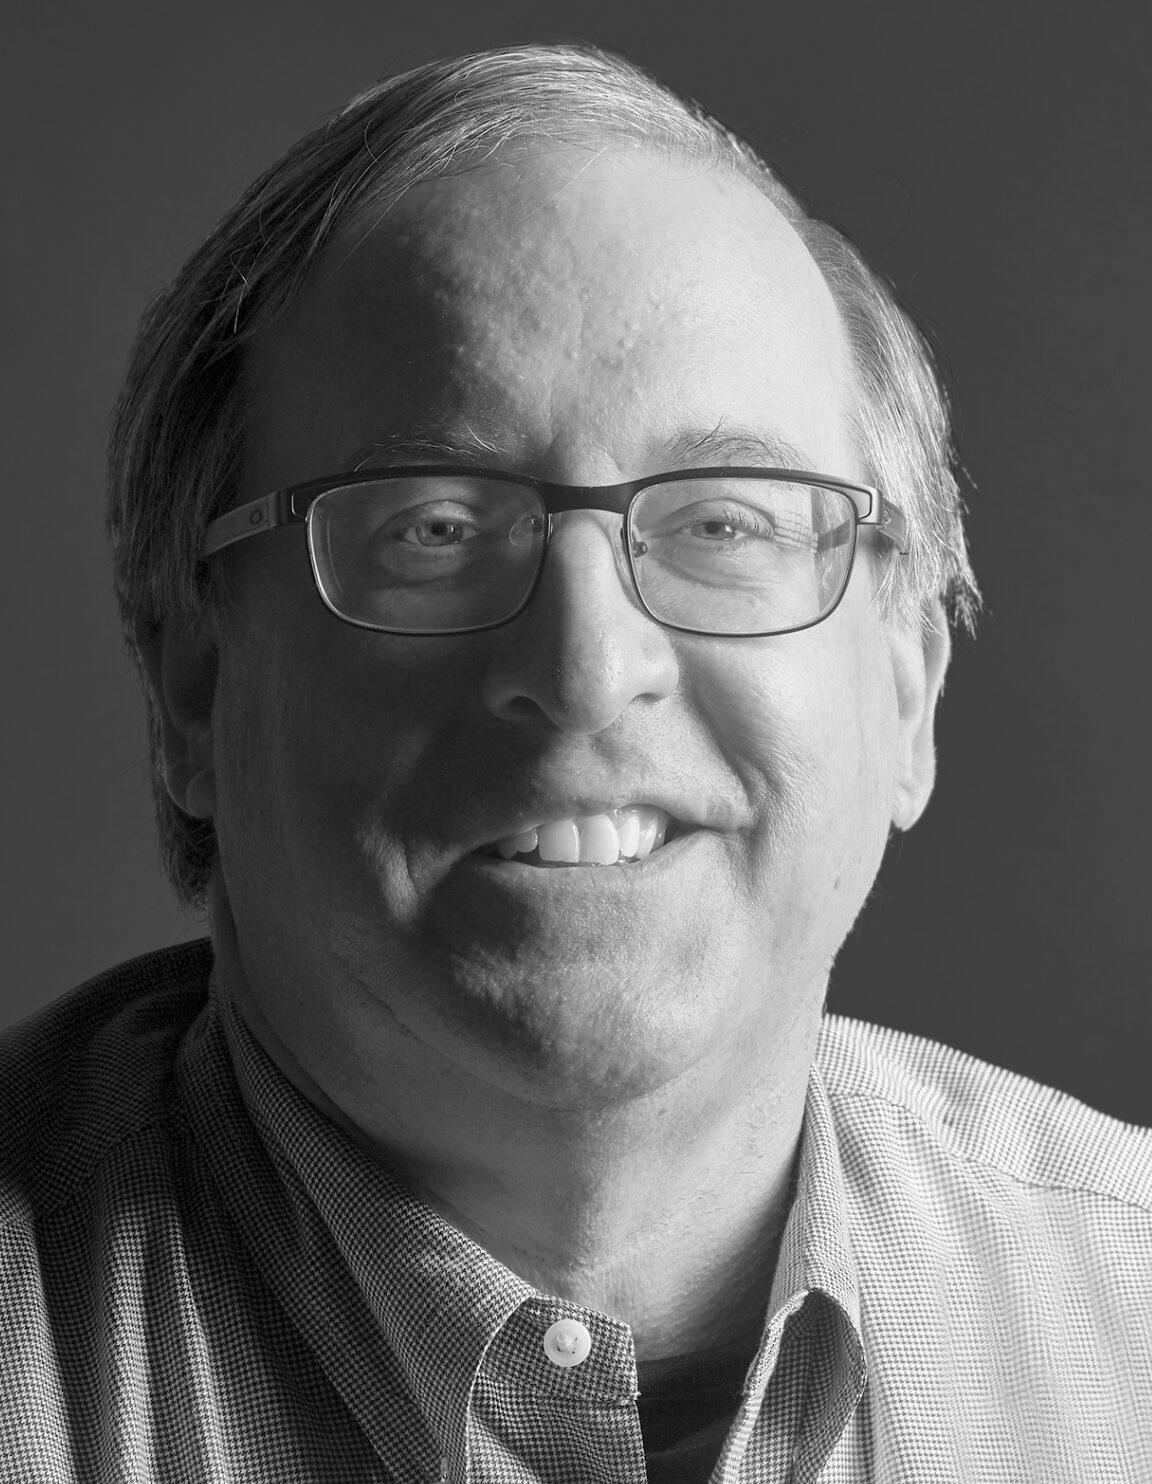 Portrait of Jeffrey Hoeflich